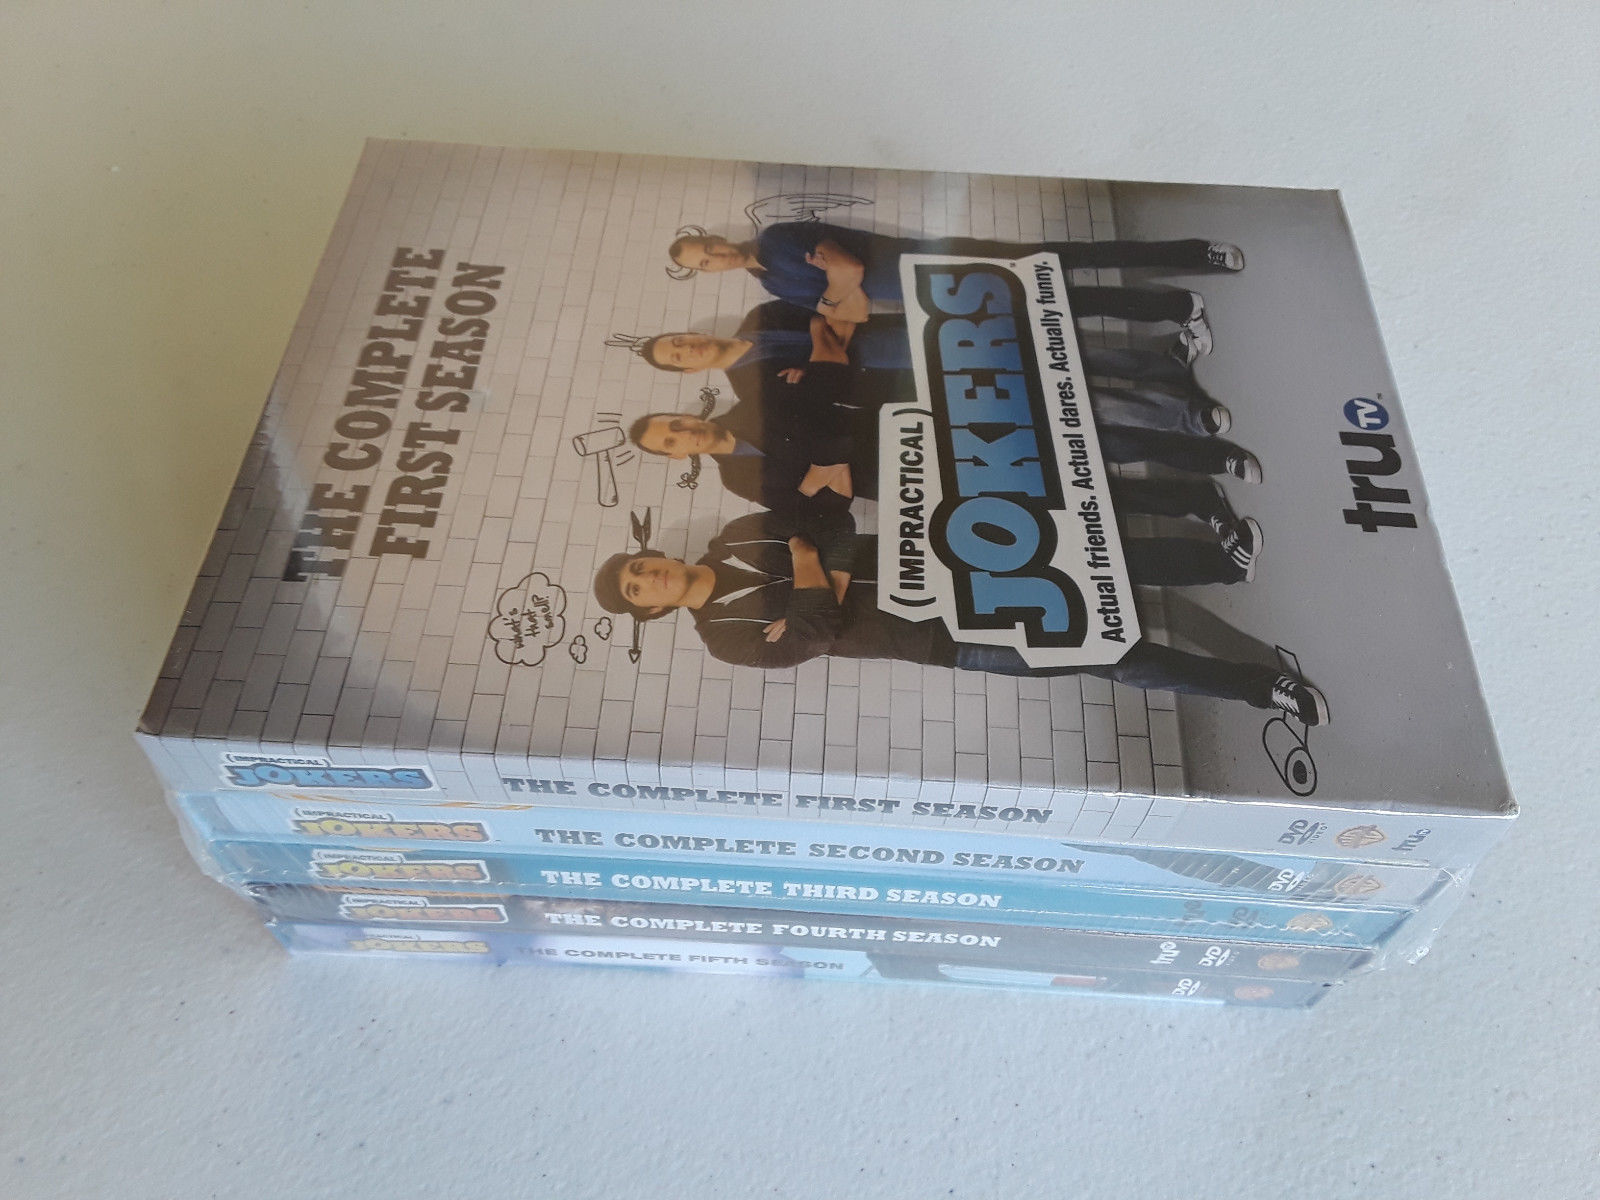 Impractical Jokers: The Complete Series Seasons 1-5 1 2 3 4 5 (DVD Sets New)